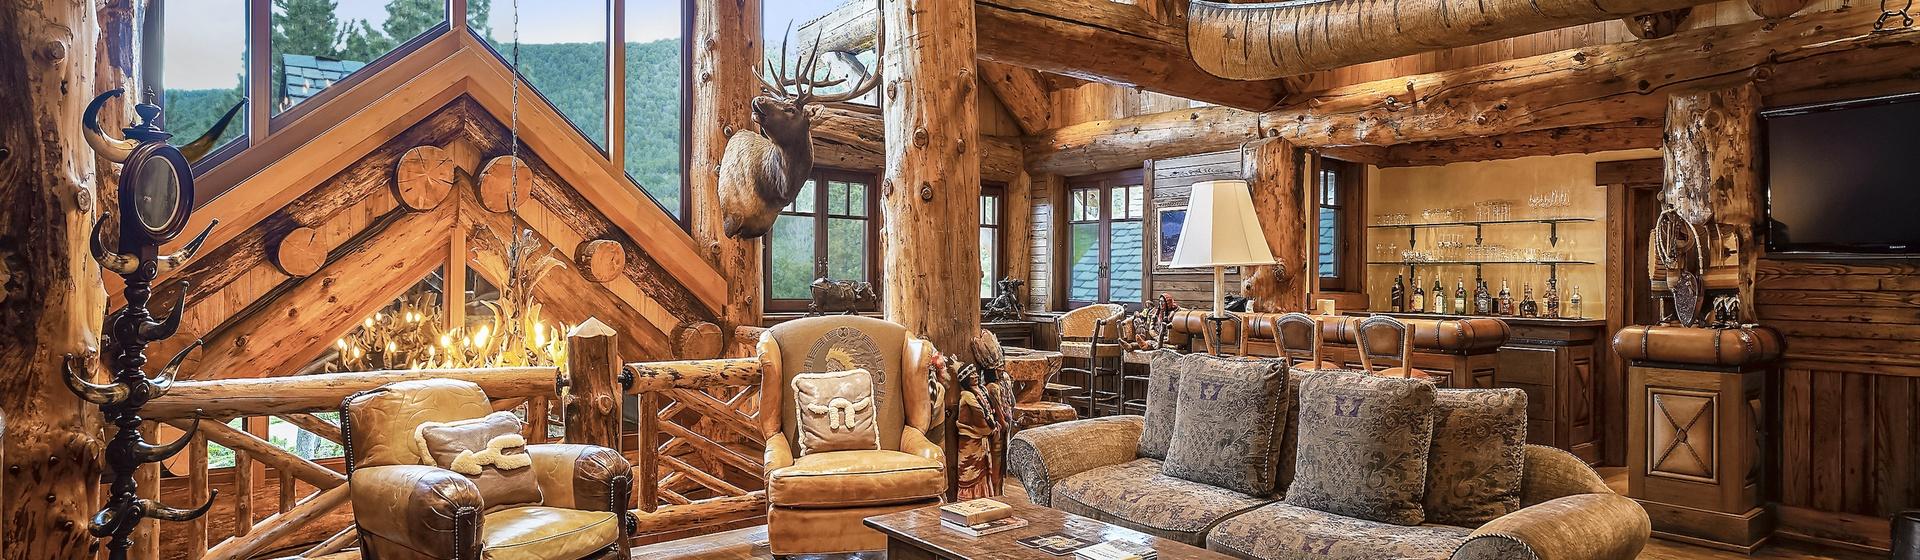 6.2-Telluride-Sleeping-Indian-Ranch-second-floor-landing-sitting-area-web.JPG